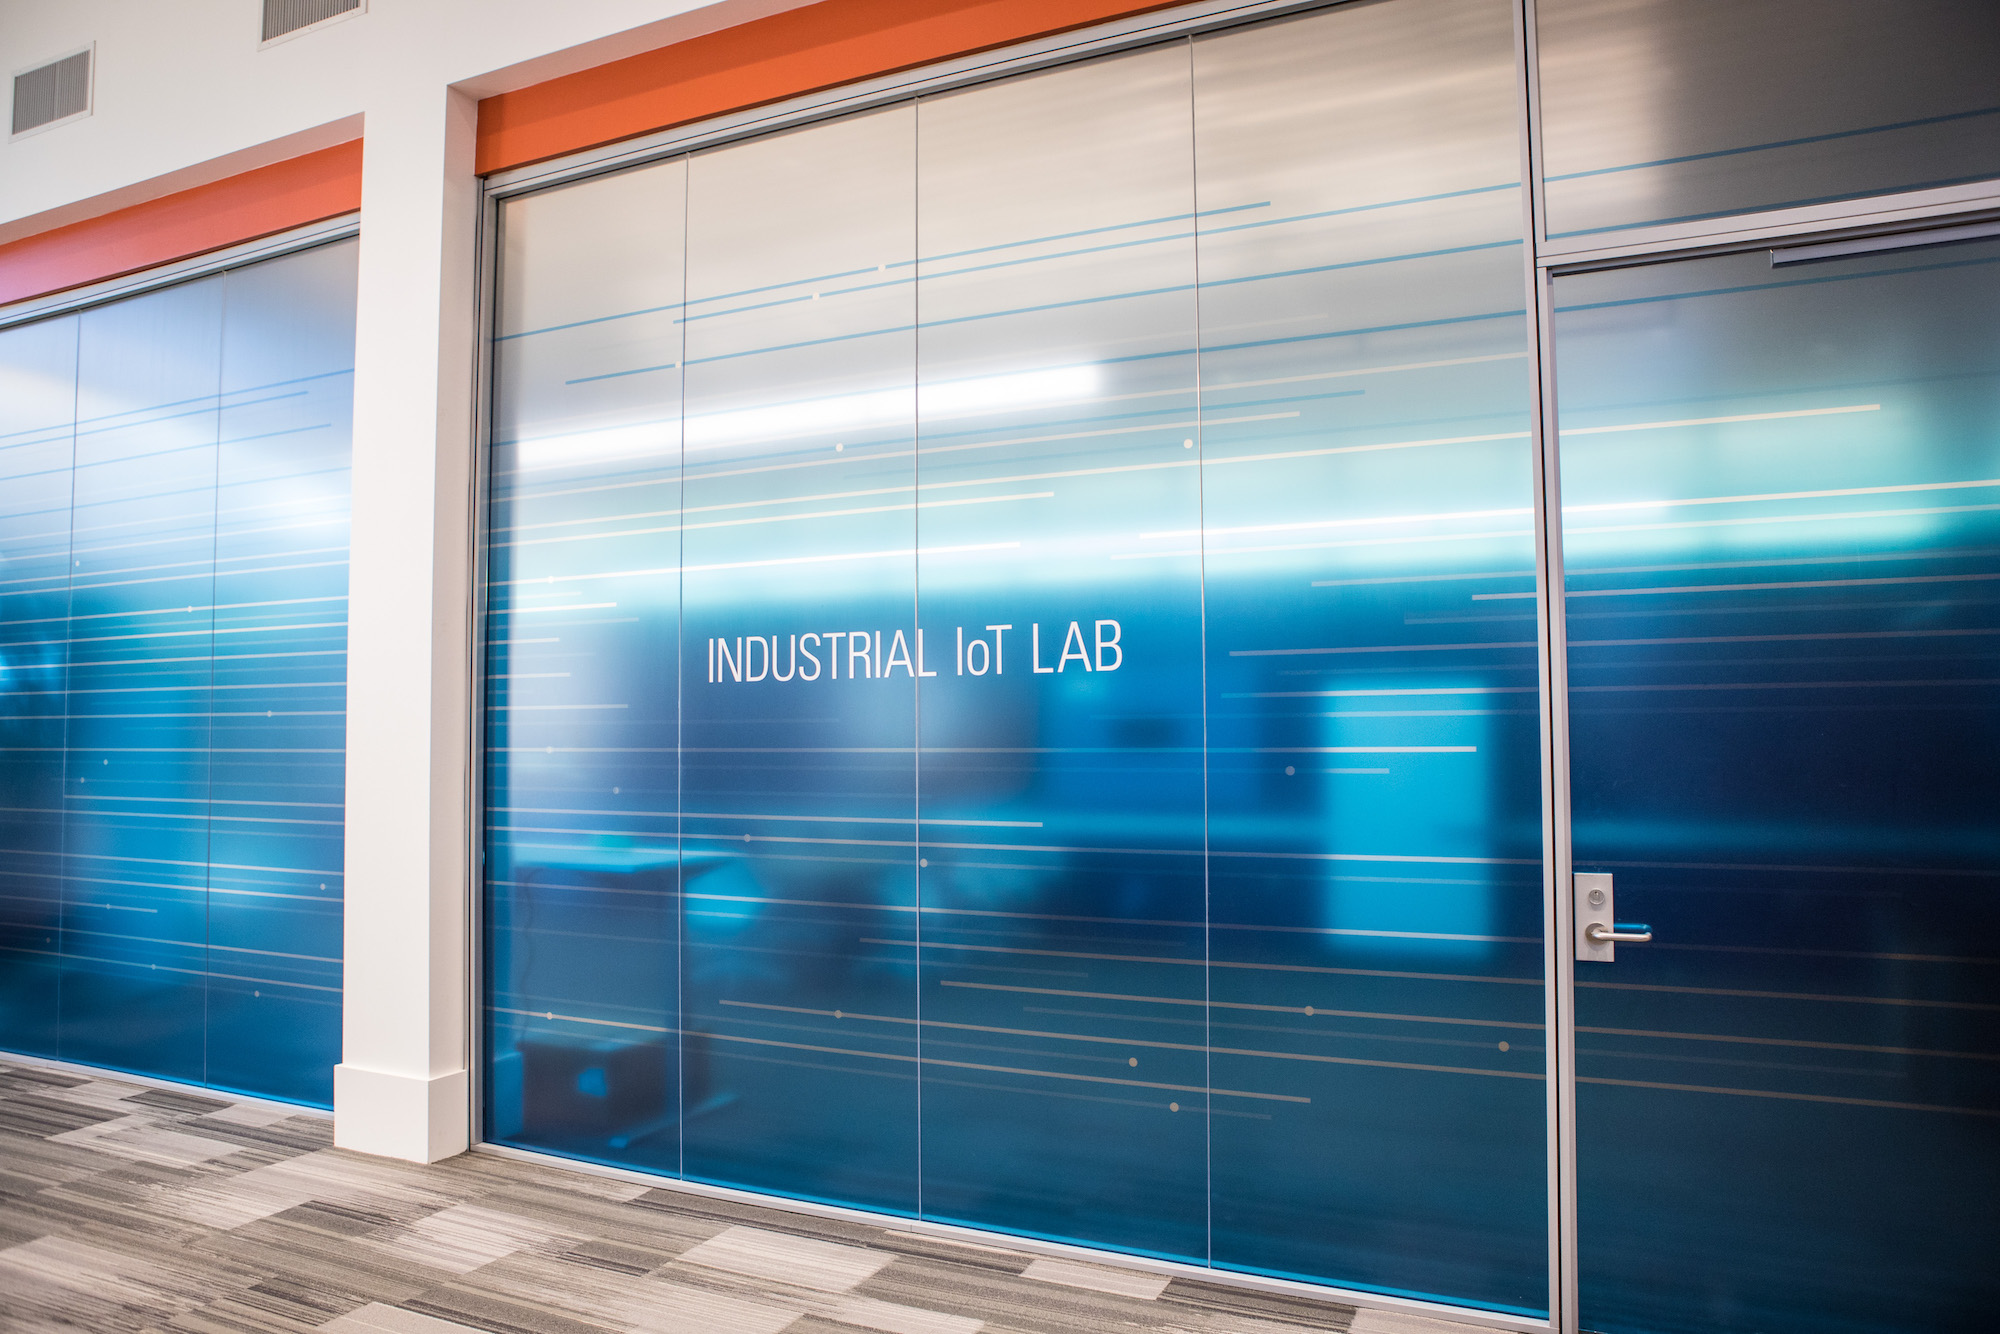 IIoT_Lab_08.jpg